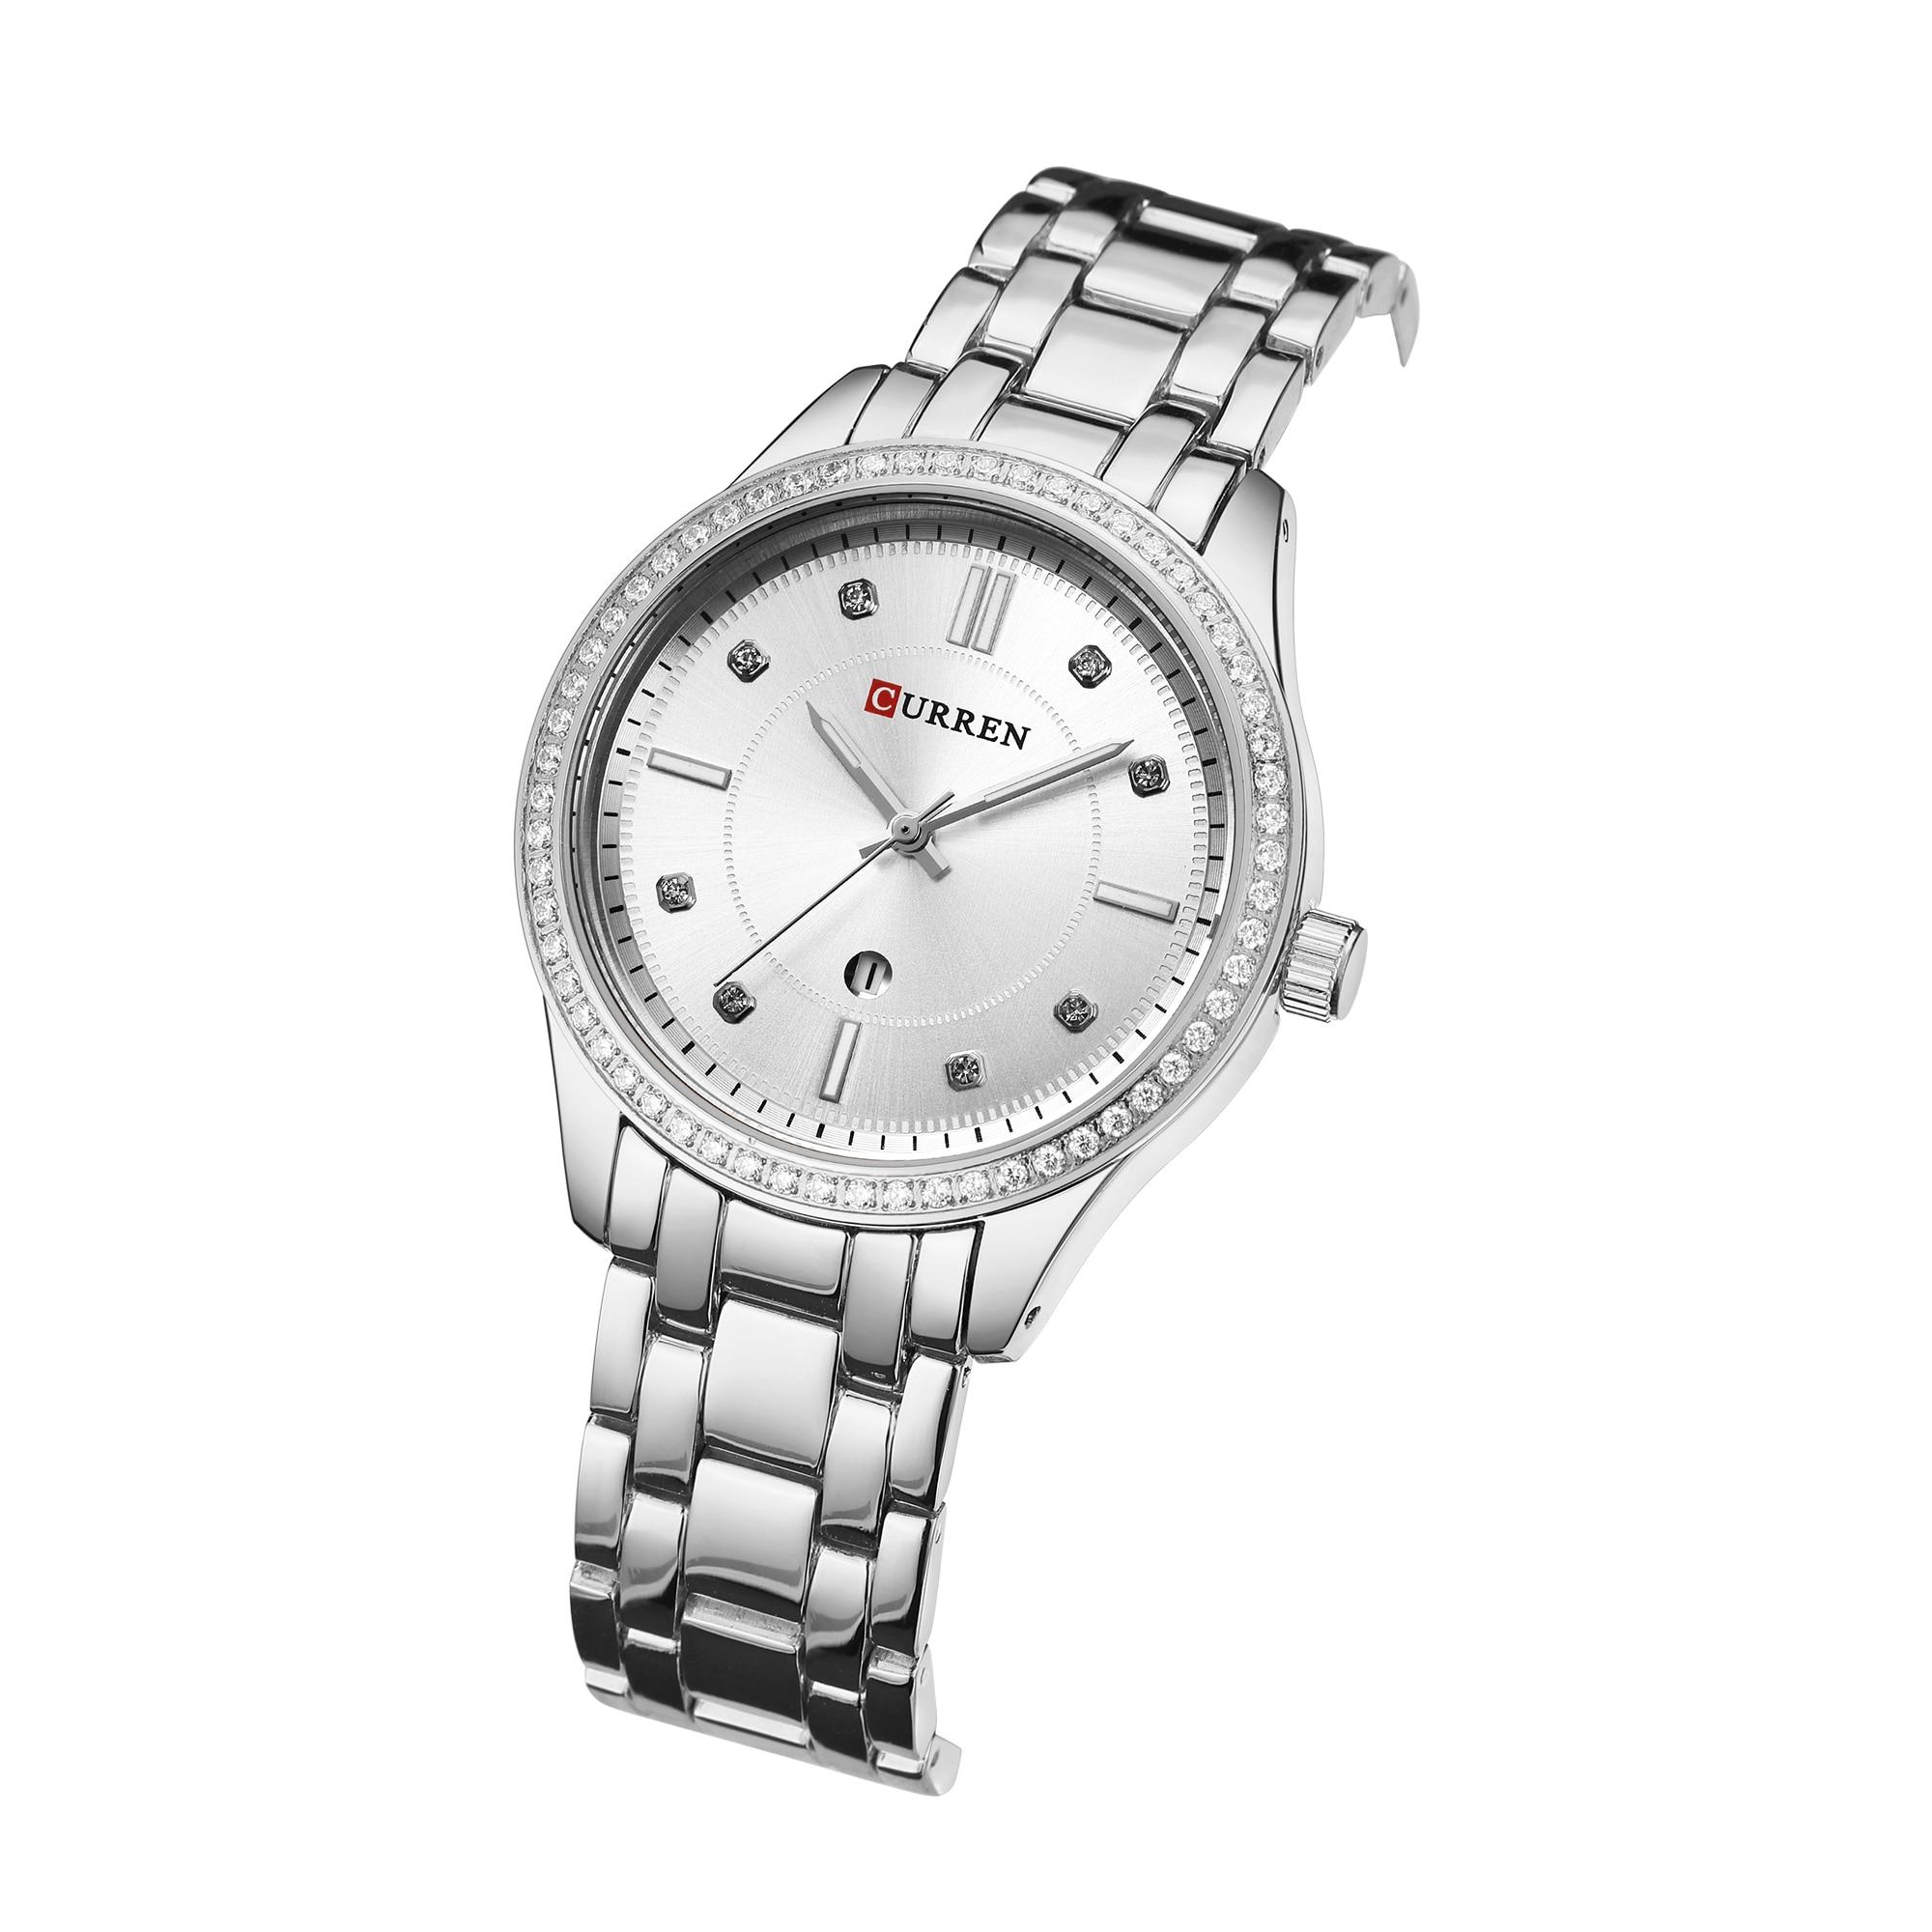 CURREN Women Watch Stainless Steel Top Brand Fashion Simples Ladies Watches Bling Rhinestones Quartz Wrist Watches Reloj Mujer curren watch relojes hombres de la marca de lujo curren reloj inteligente montre relojes curren men watch